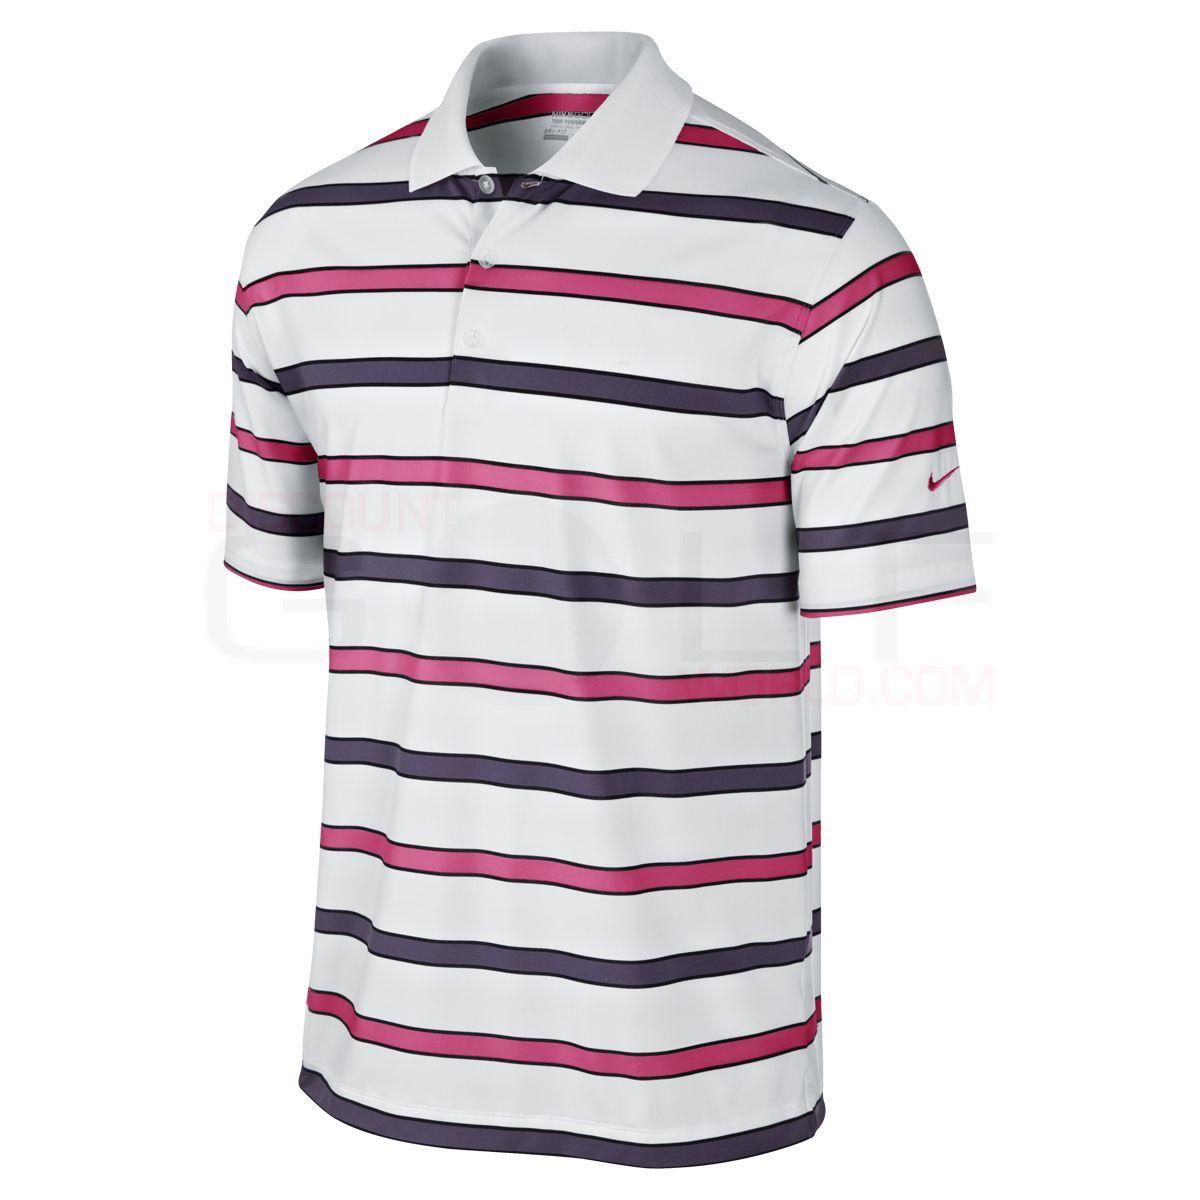 162874e2 Nike Key Bold Heather Stripe Polo 585824 in 2019 | Golf Shirts | Polo, Golf  shirts, Golf polo shirts